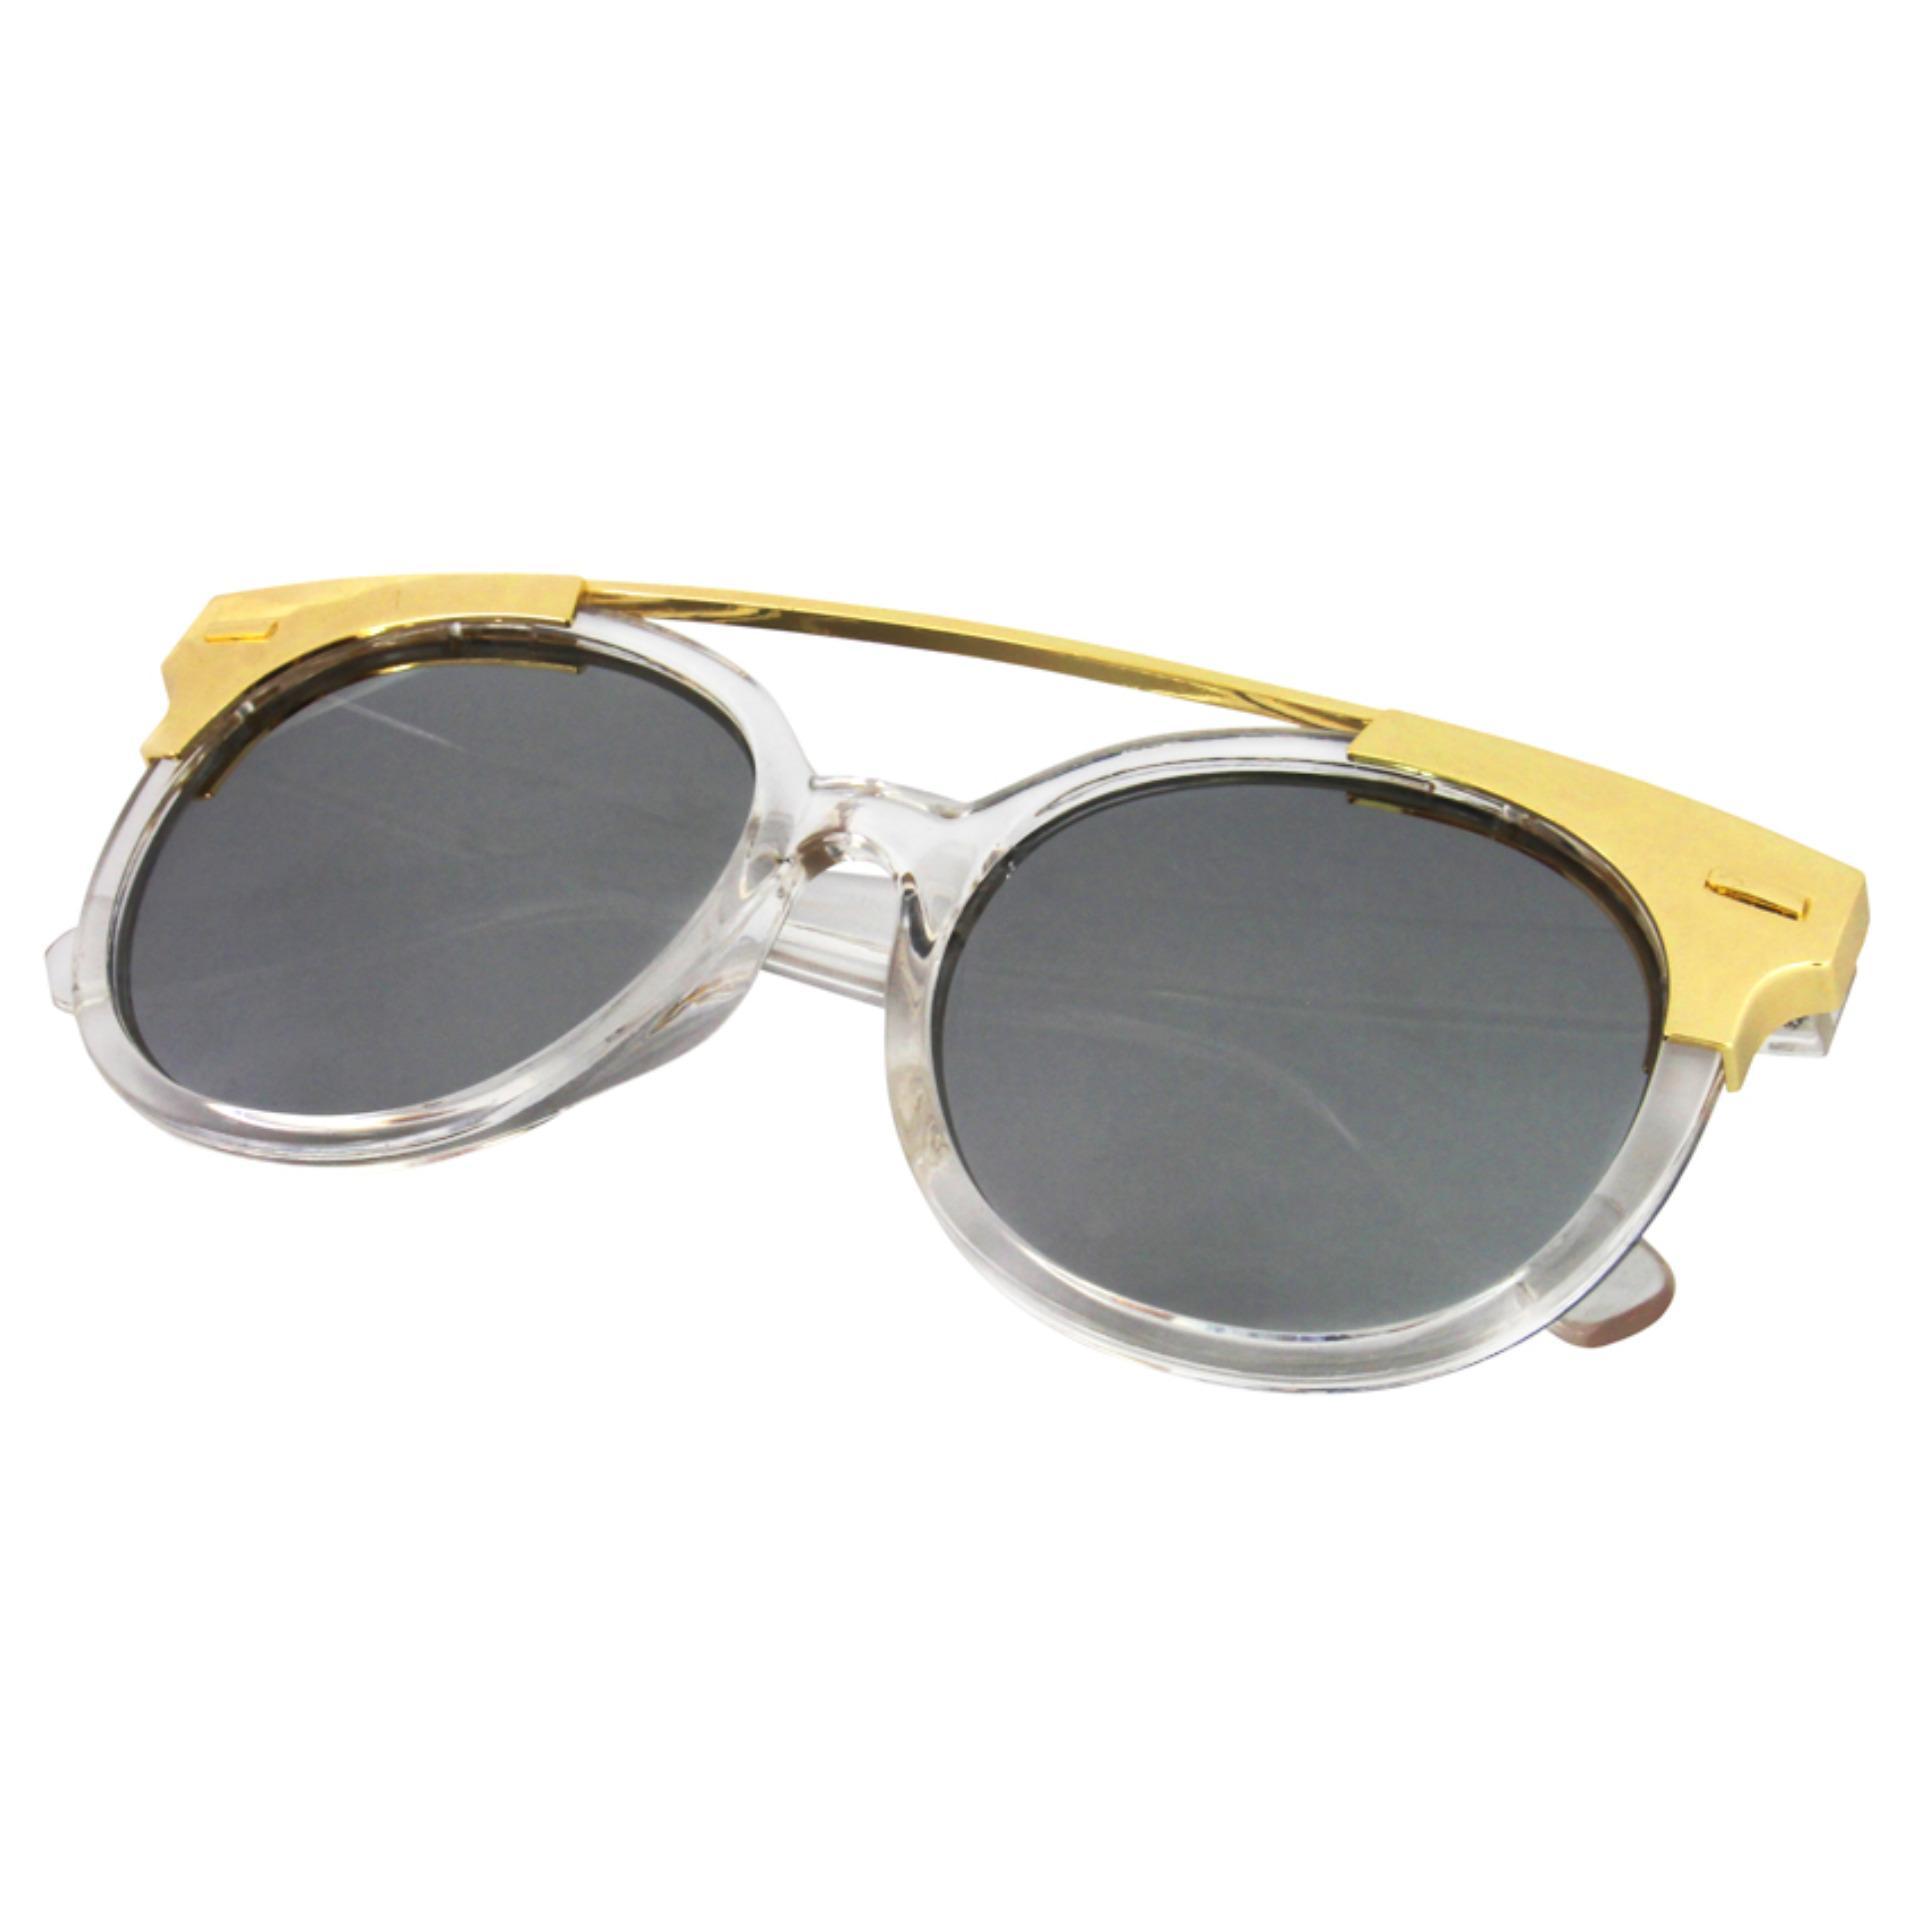 Cat Eye Sunglasses Cat 5019 Black Golden Kacamata Wanita Daftar Source · Cat Eye Sunglasses CAT